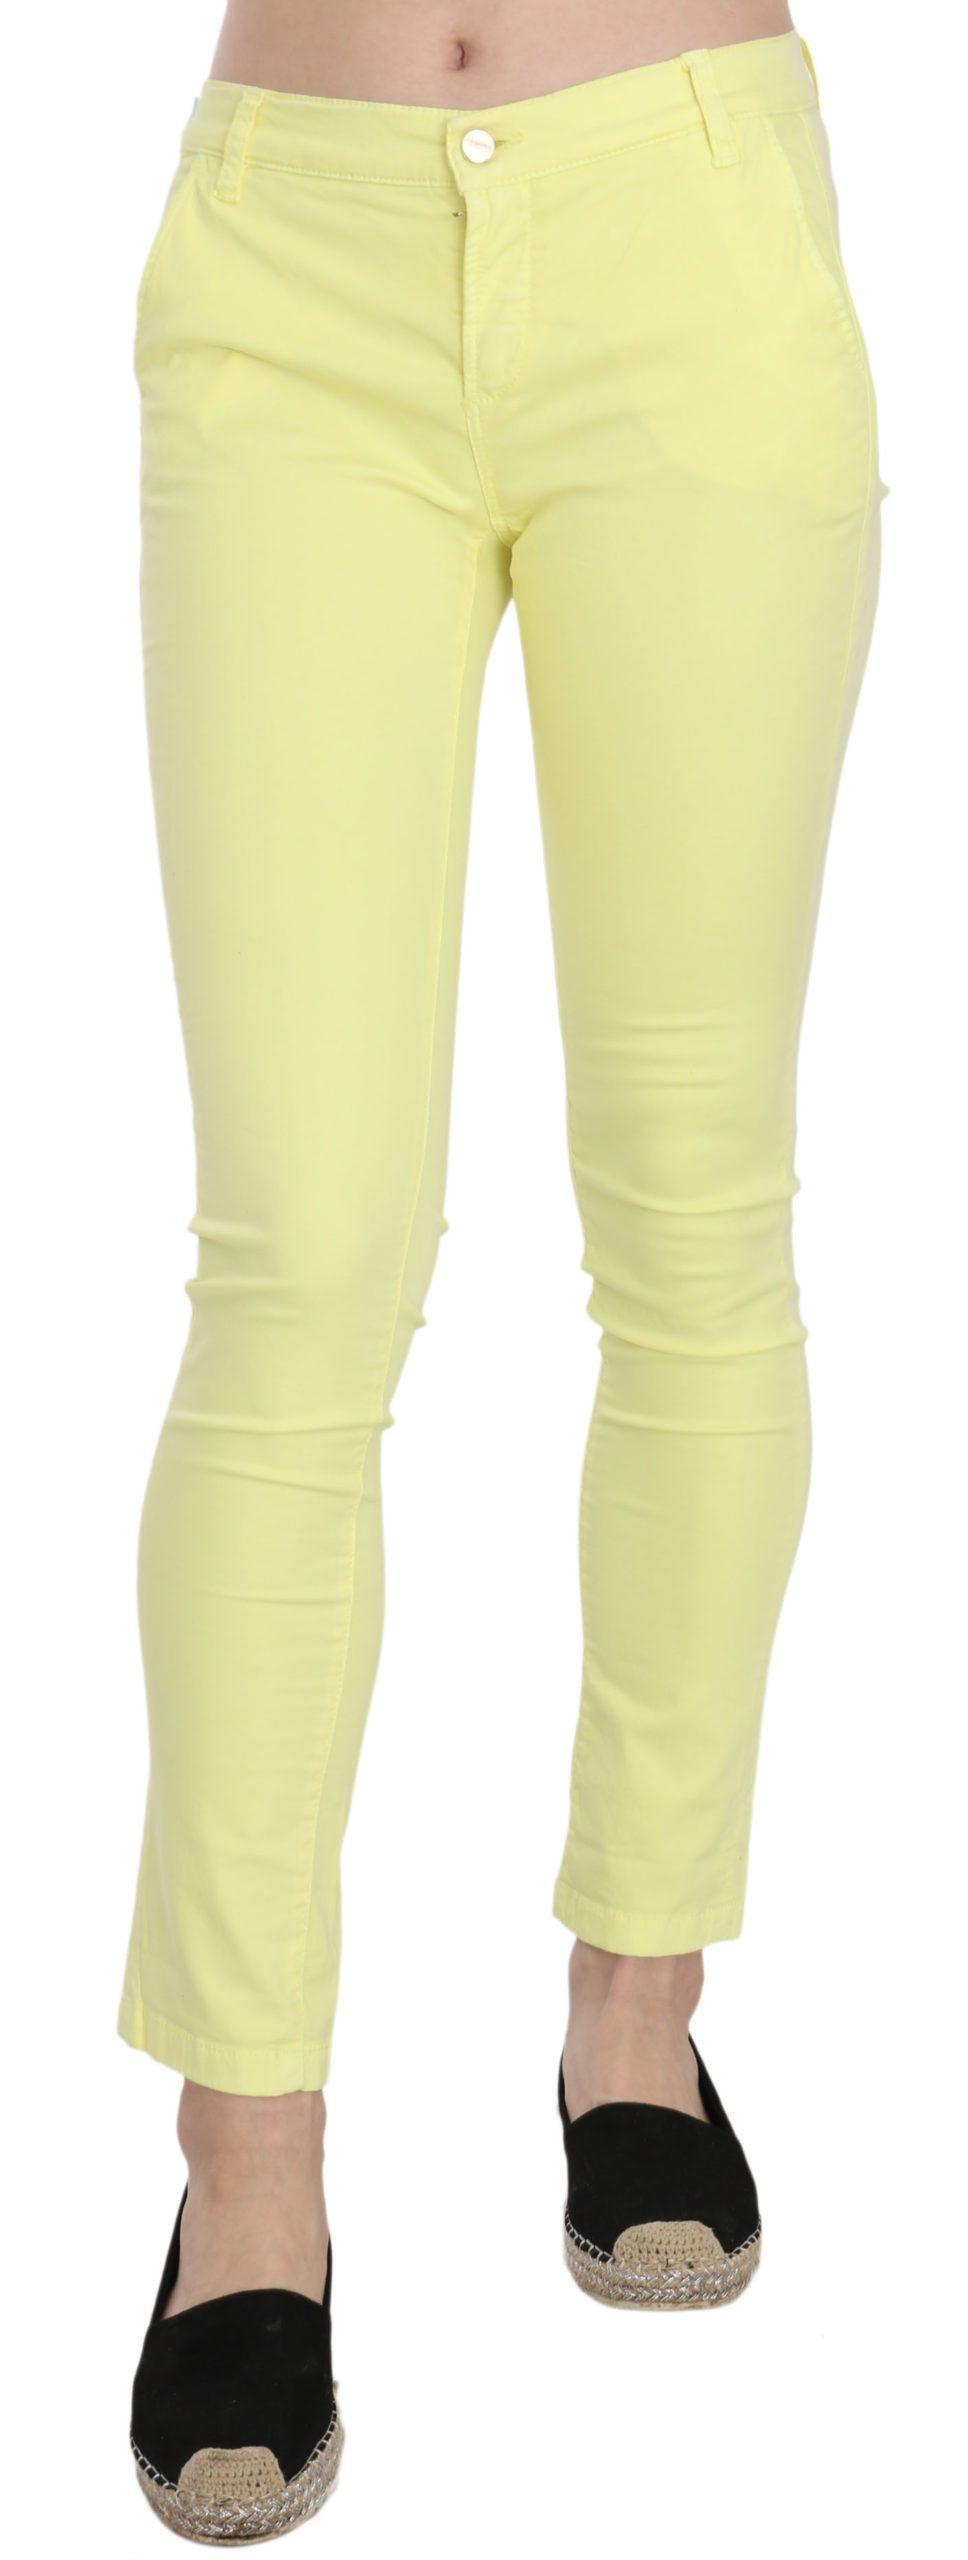 PINKO Women's Cotton Stretch Low Waist Skinny Trouser Yellow PAN70191 - W26